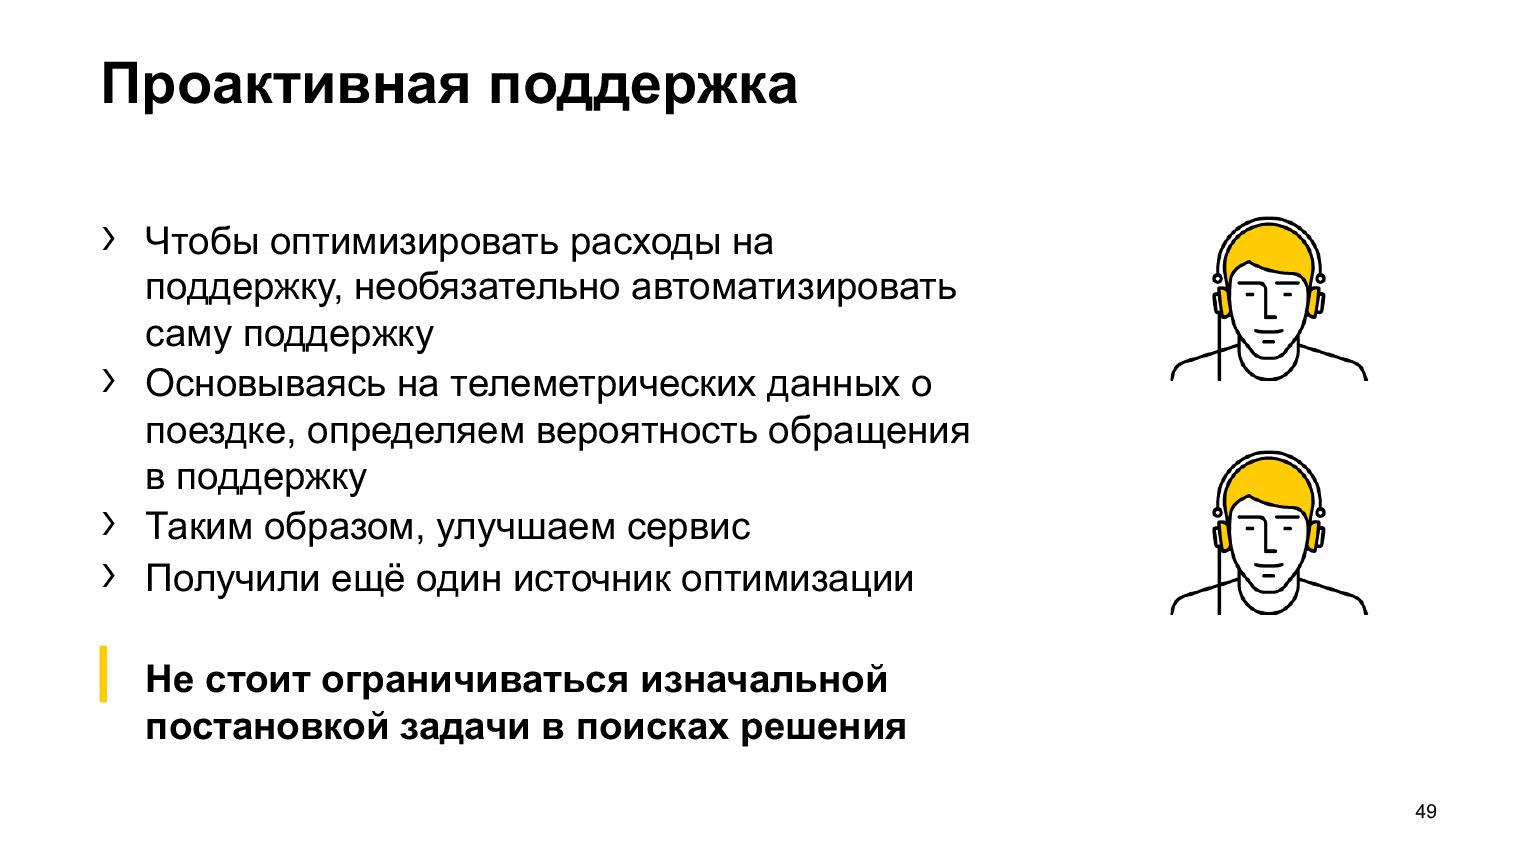 Как коронавирус повлиял на ML-проекты Такси, Еды и Лавки. Доклад Яндекса - 17